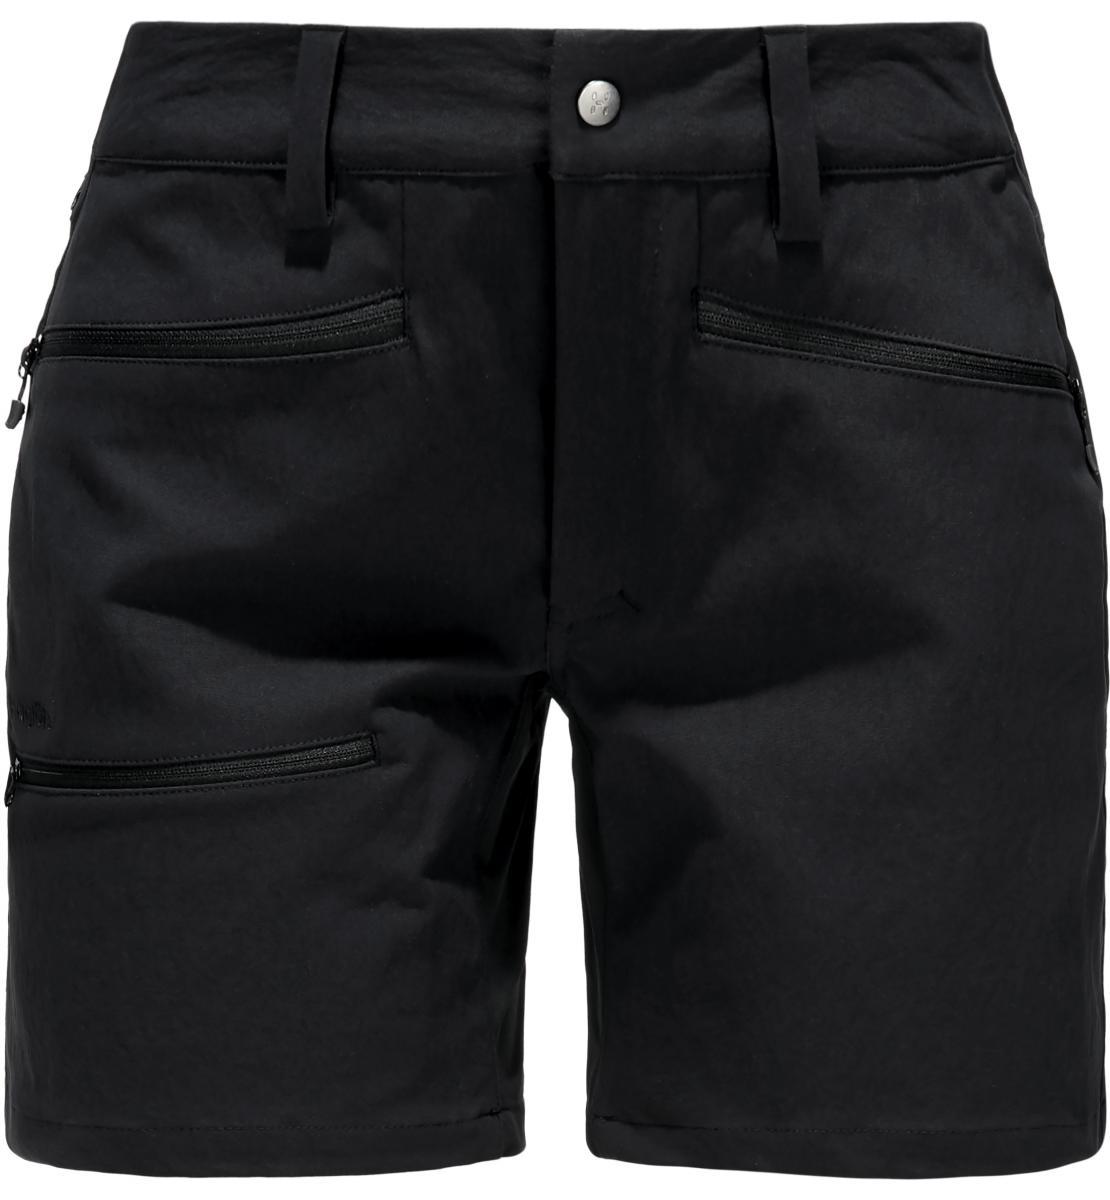 Haglöfs  Rugged Flex Shorts Women